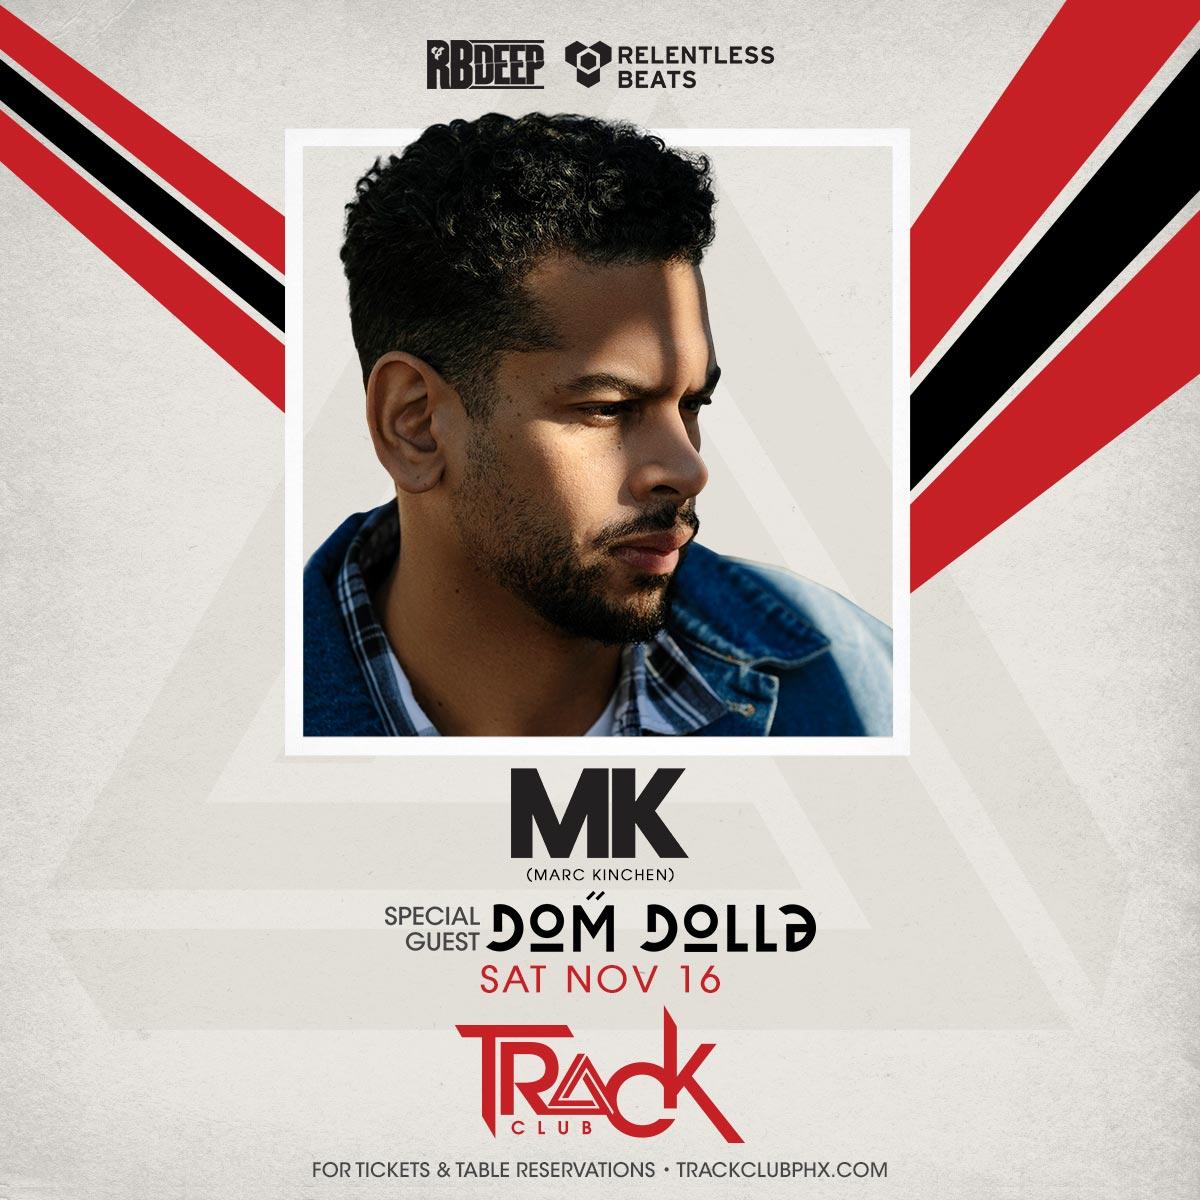 Flyer for MK + Dom Dolla